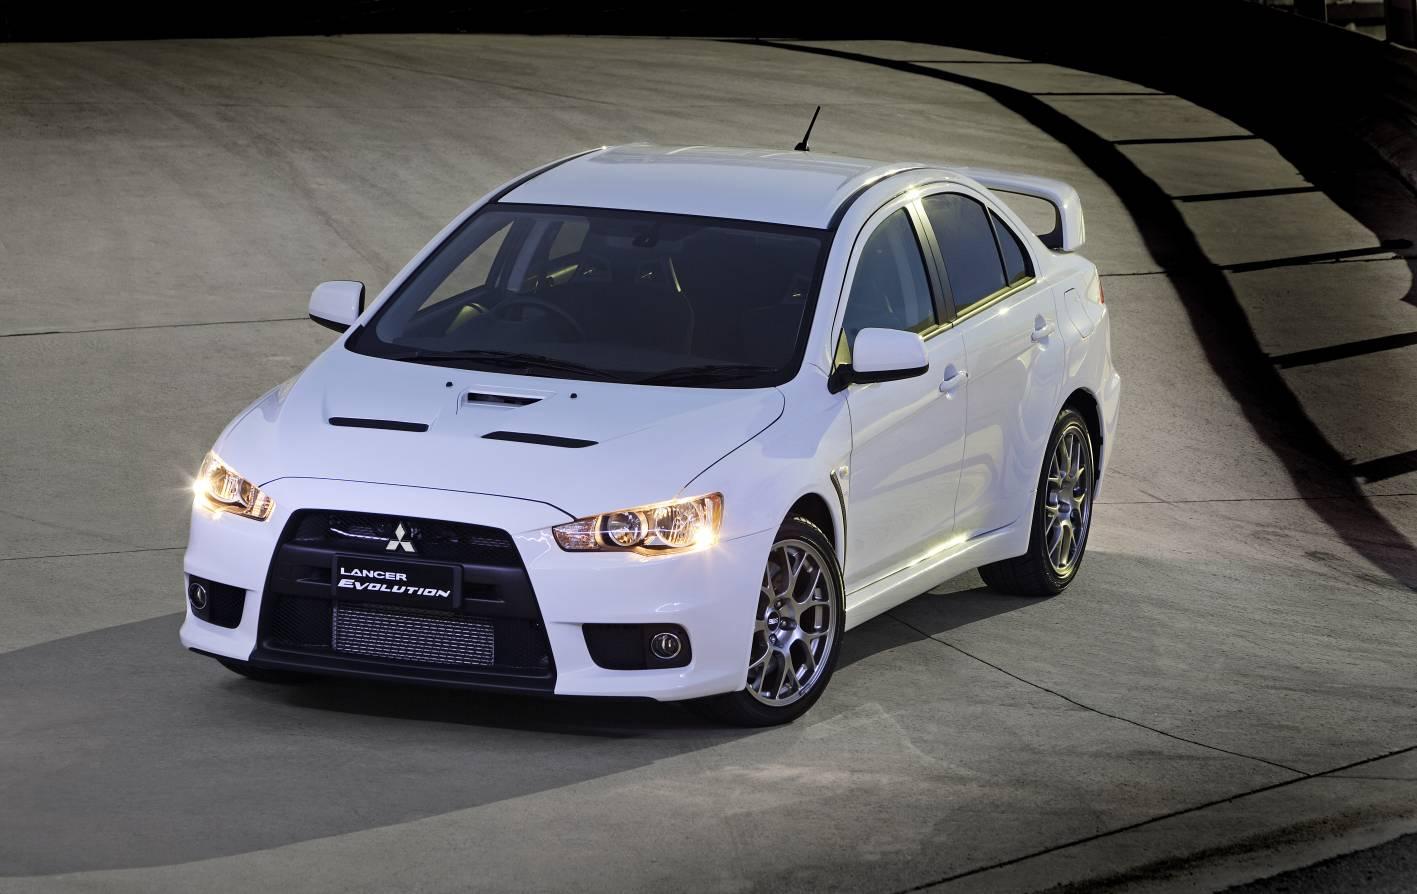 mitsubishi lancer evolution x 2014 sofisticado y poderoso lista de - Mitsubishi Lancer 2014 Blue